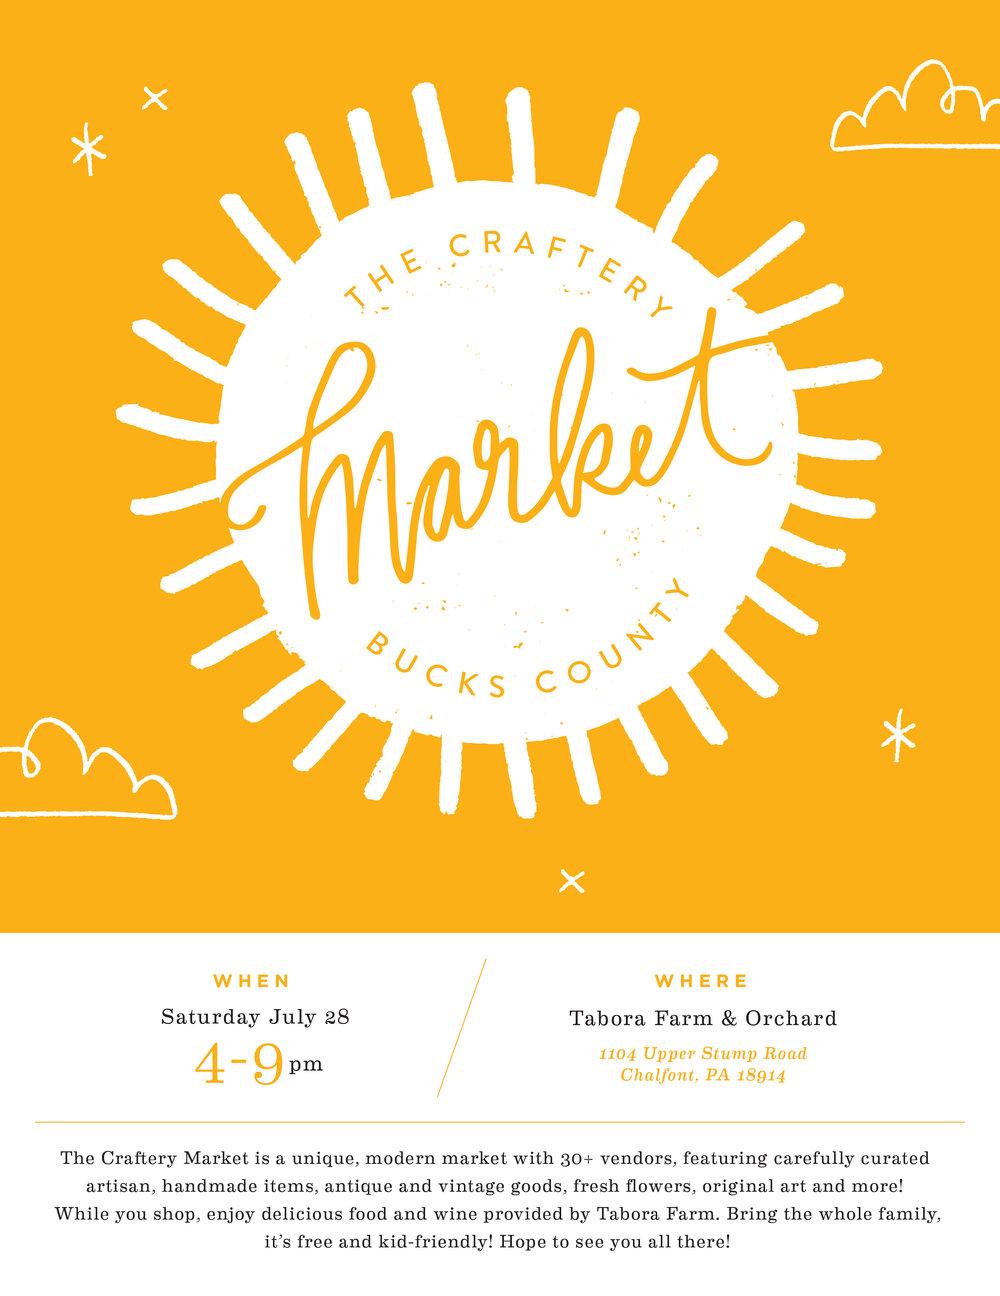 Summer-CrafteryMarket-Flyer 2.jpg